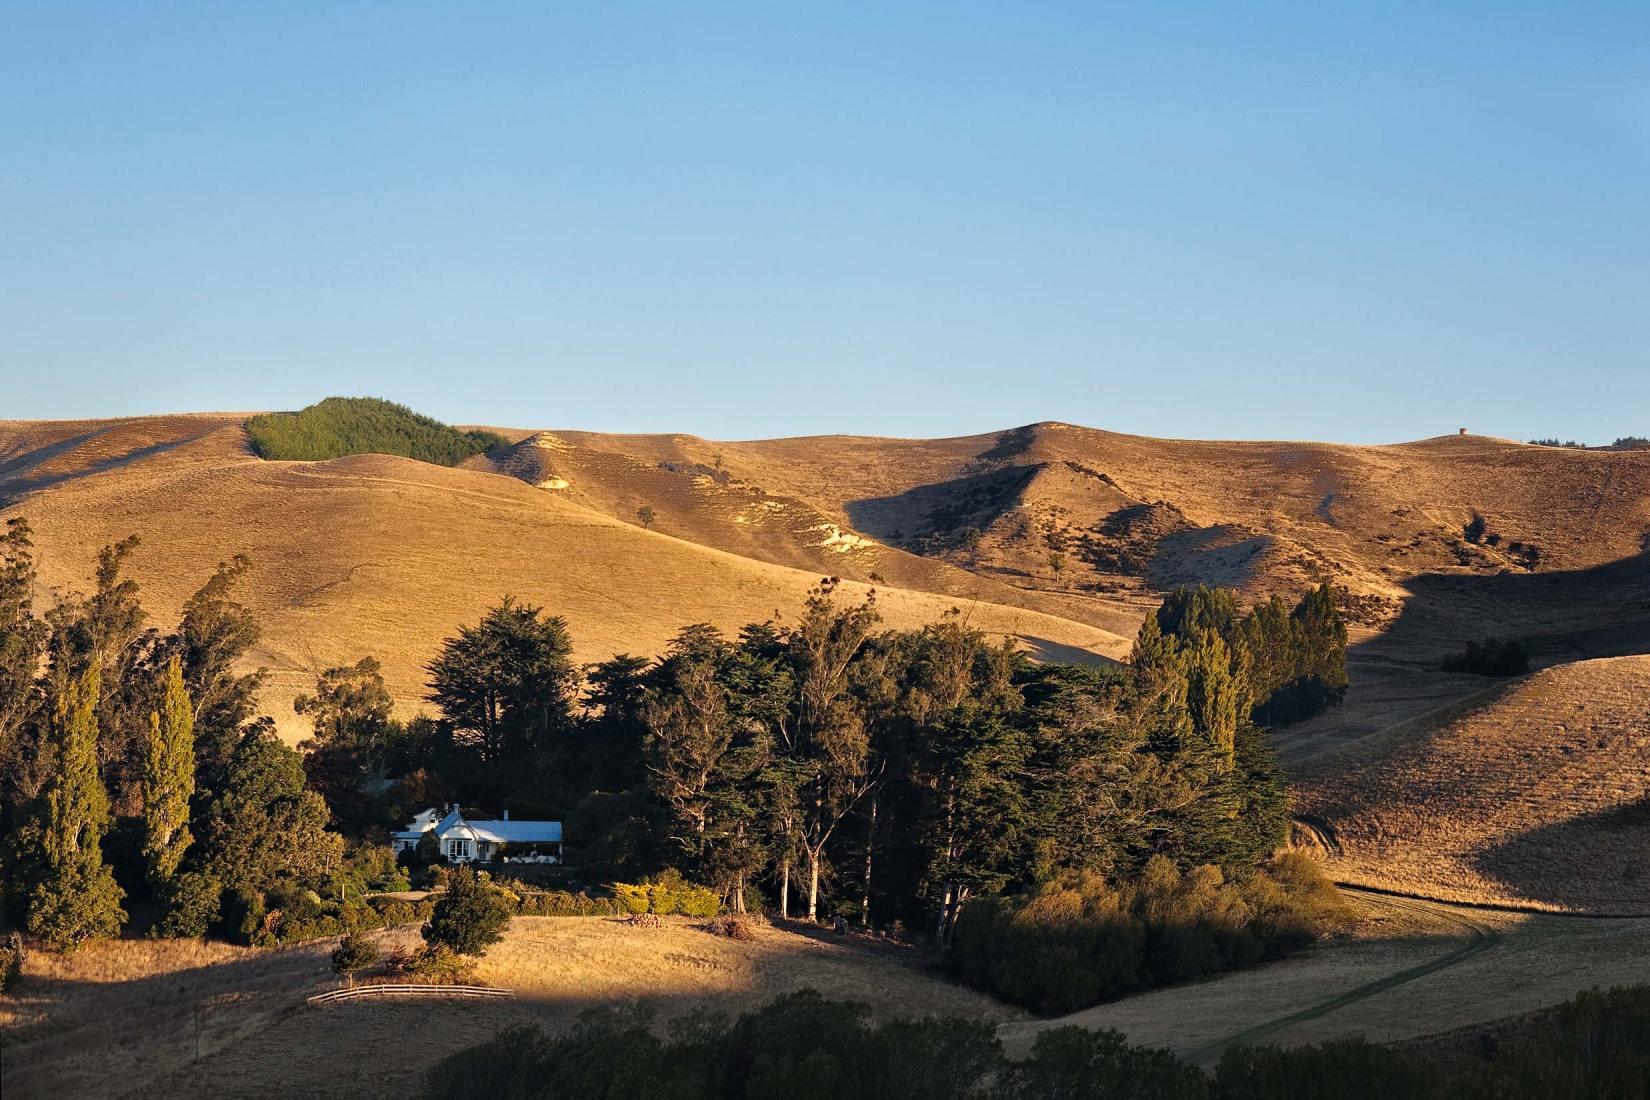 10014-0752-Image-Workshop-Melbourne-photographer-New-Zealand-farm-landscape-Waimate